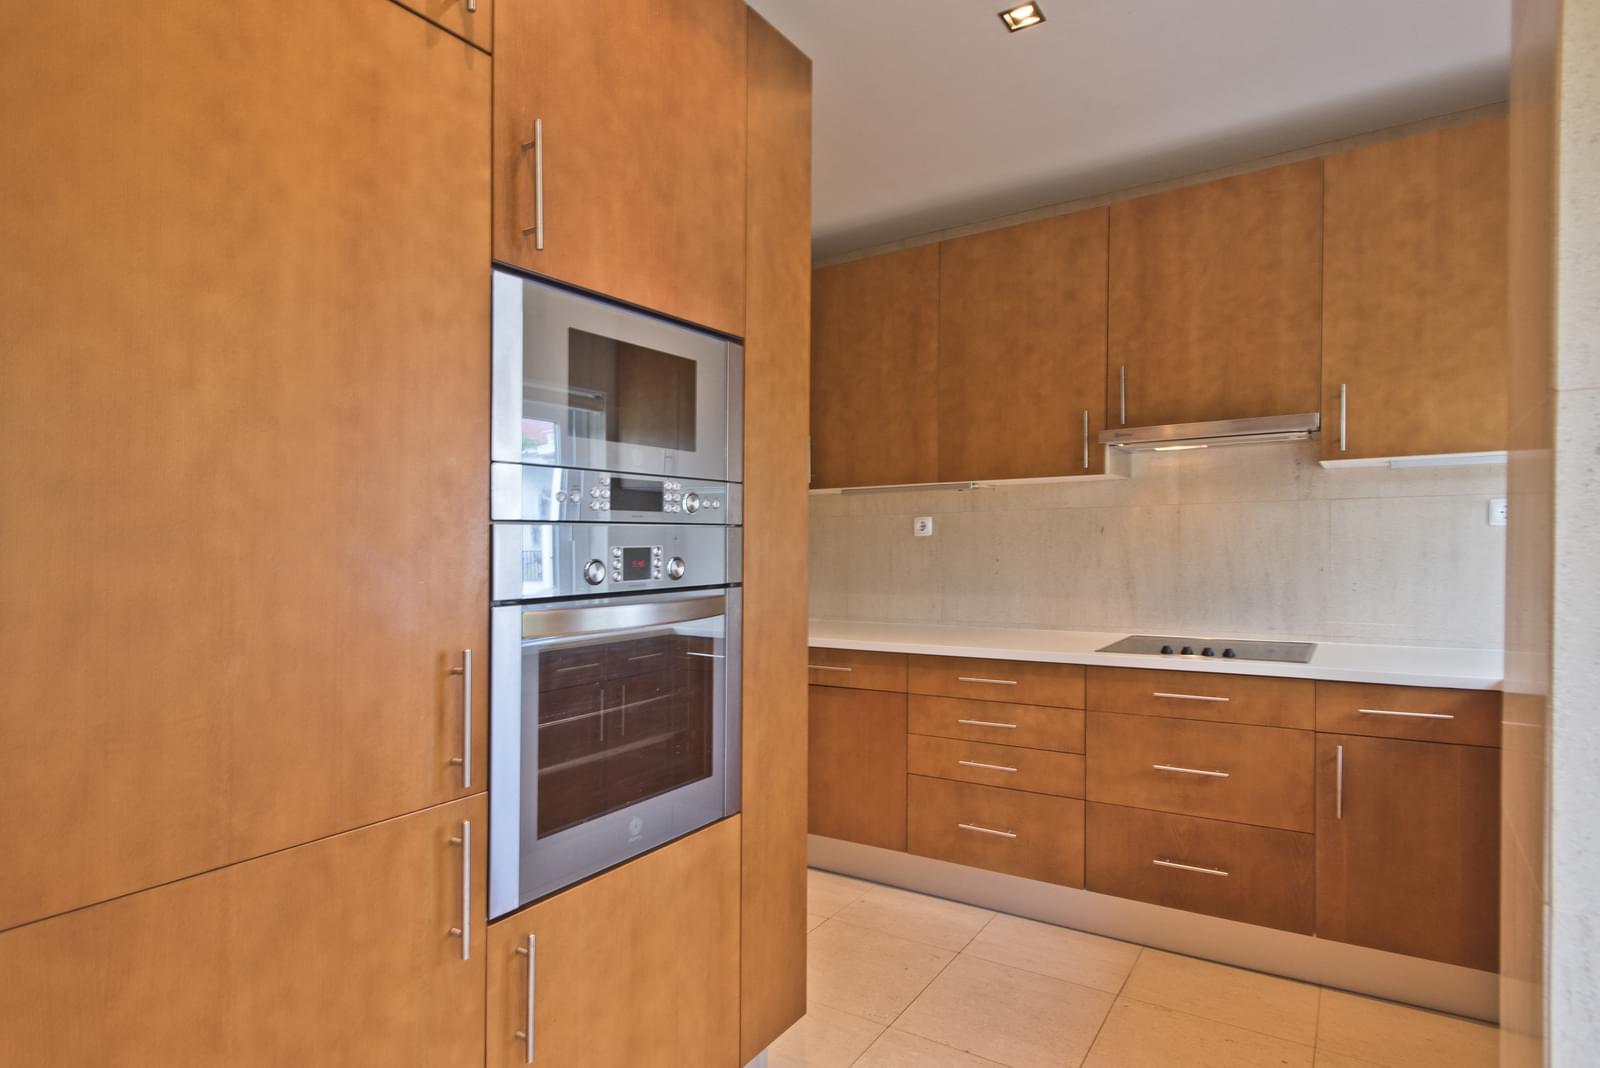 pf17006-apartamento-t1-cascais-9939a906-bcf4-4955-b4f7-ee8a2c98bdb5